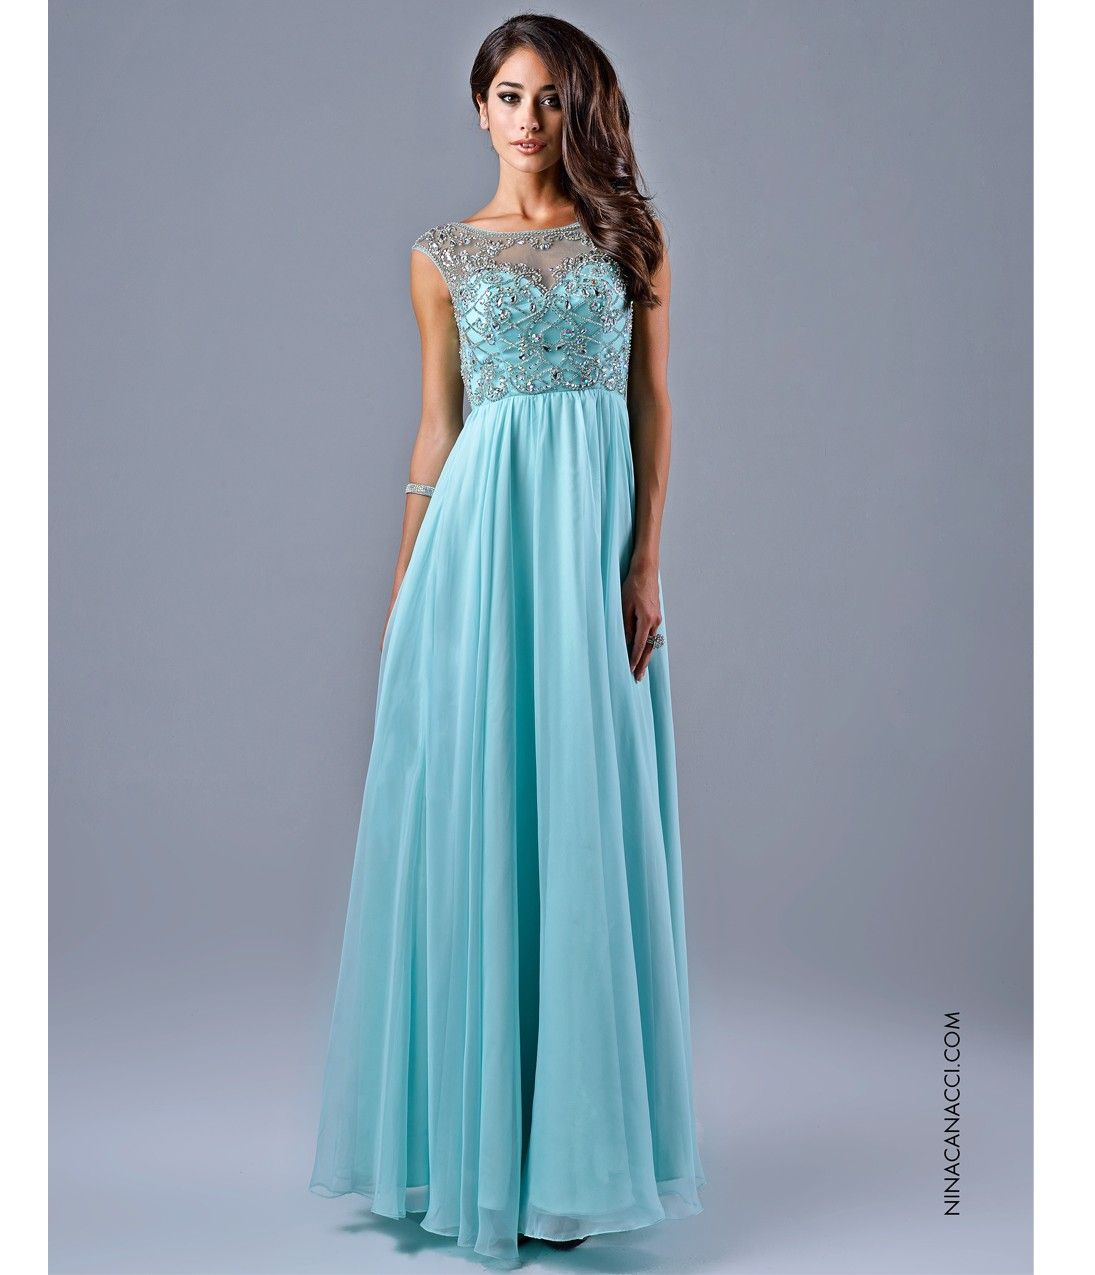 Lovely Sonique Prom Dresses Gallery - Wedding Ideas - memiocall.com